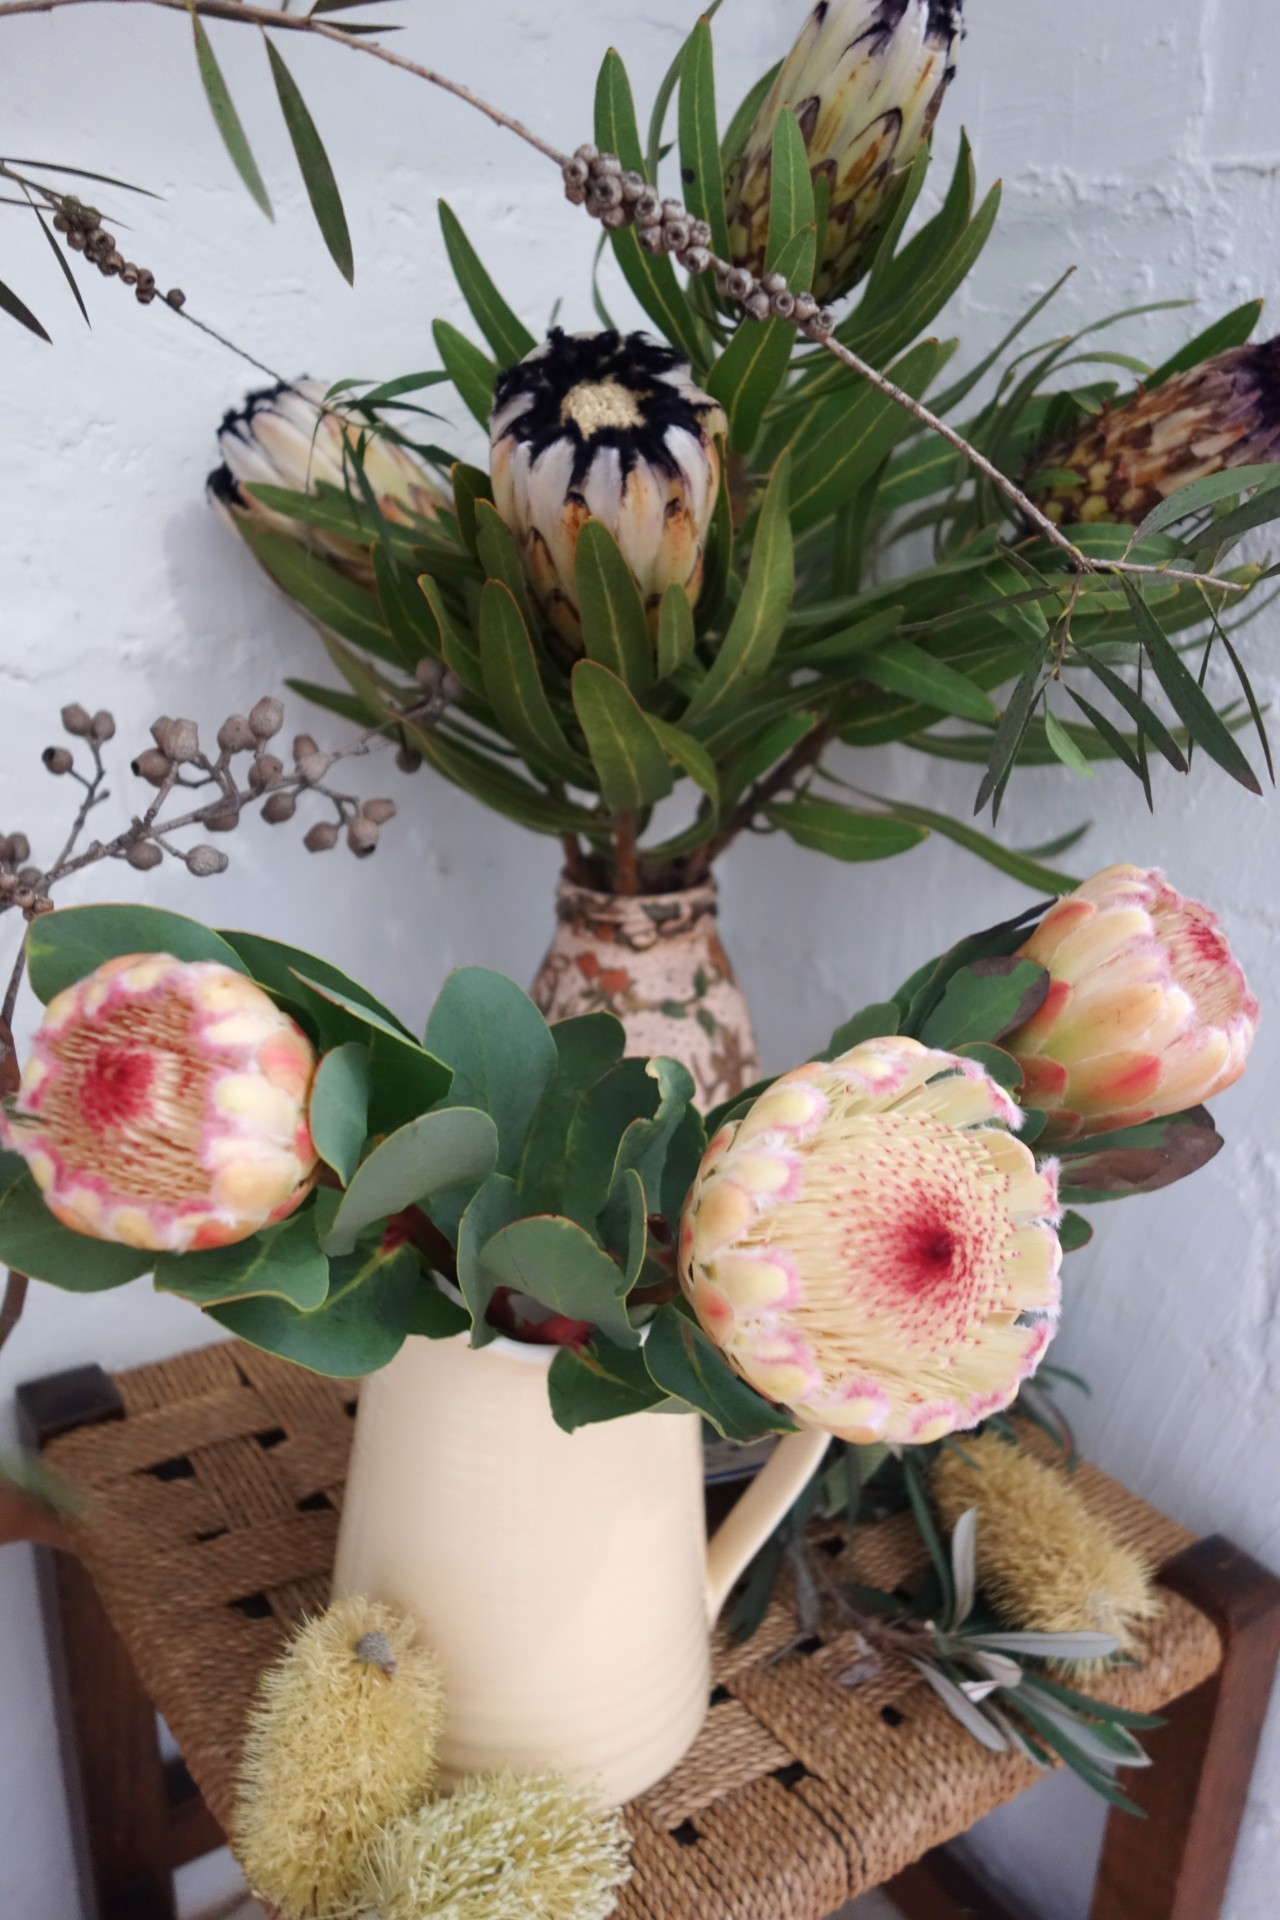 Cream mink and susara proteas